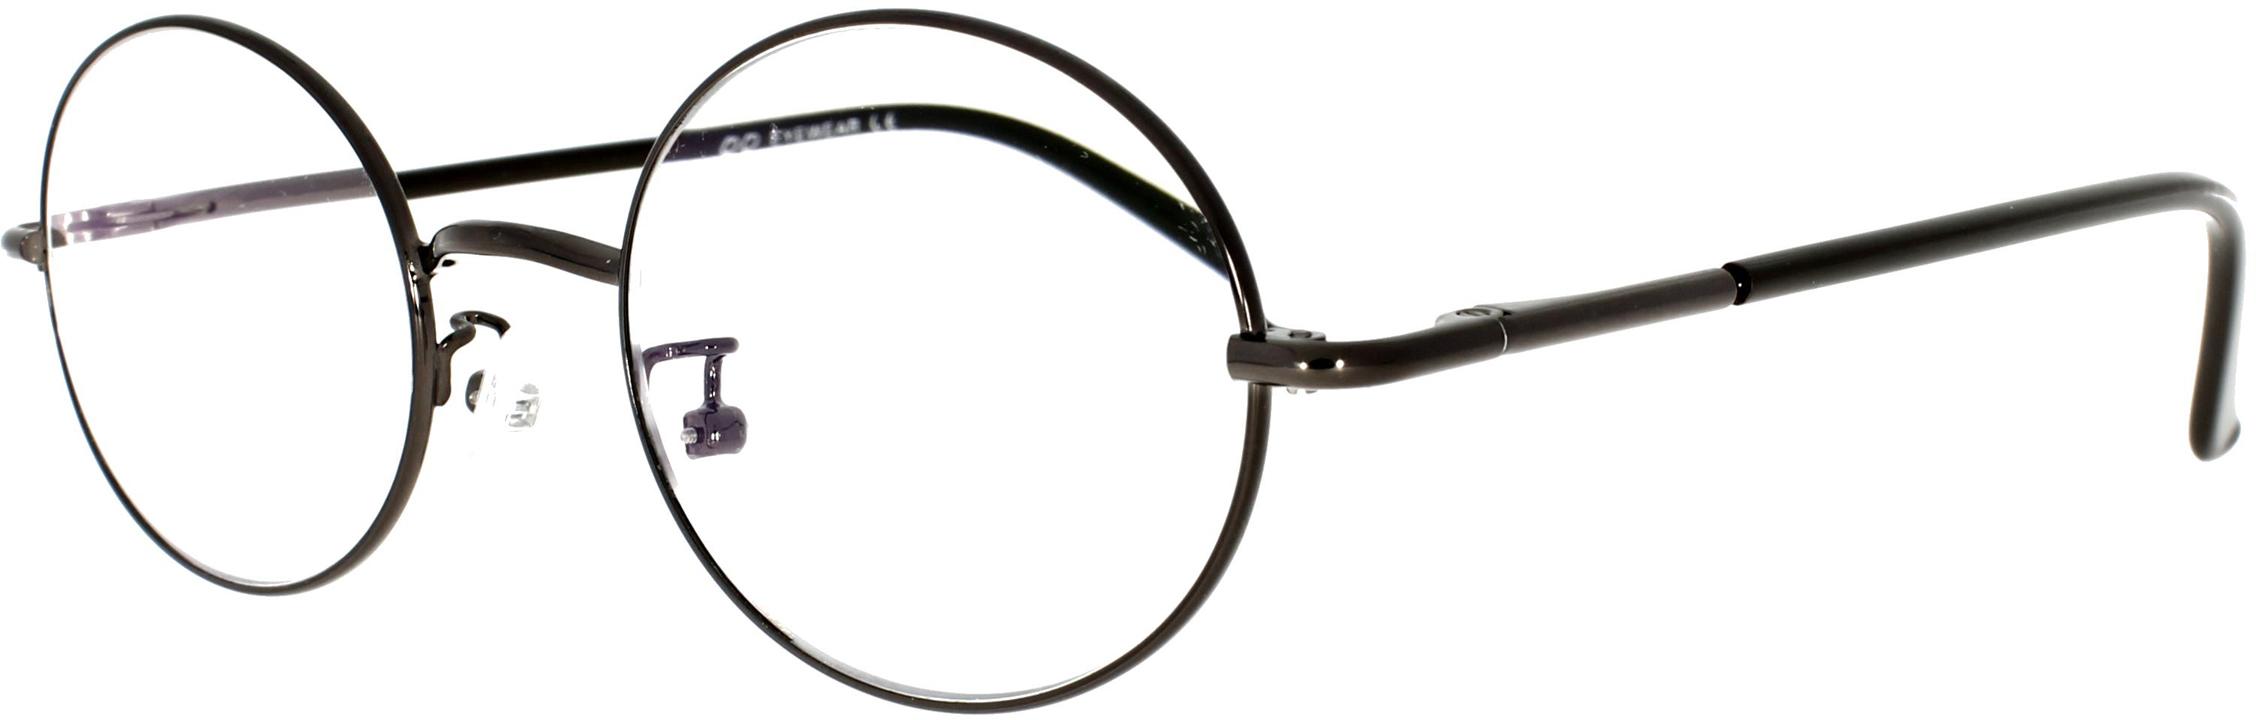 Panto-Arbeitsplatzbrille aus Metall in Braun